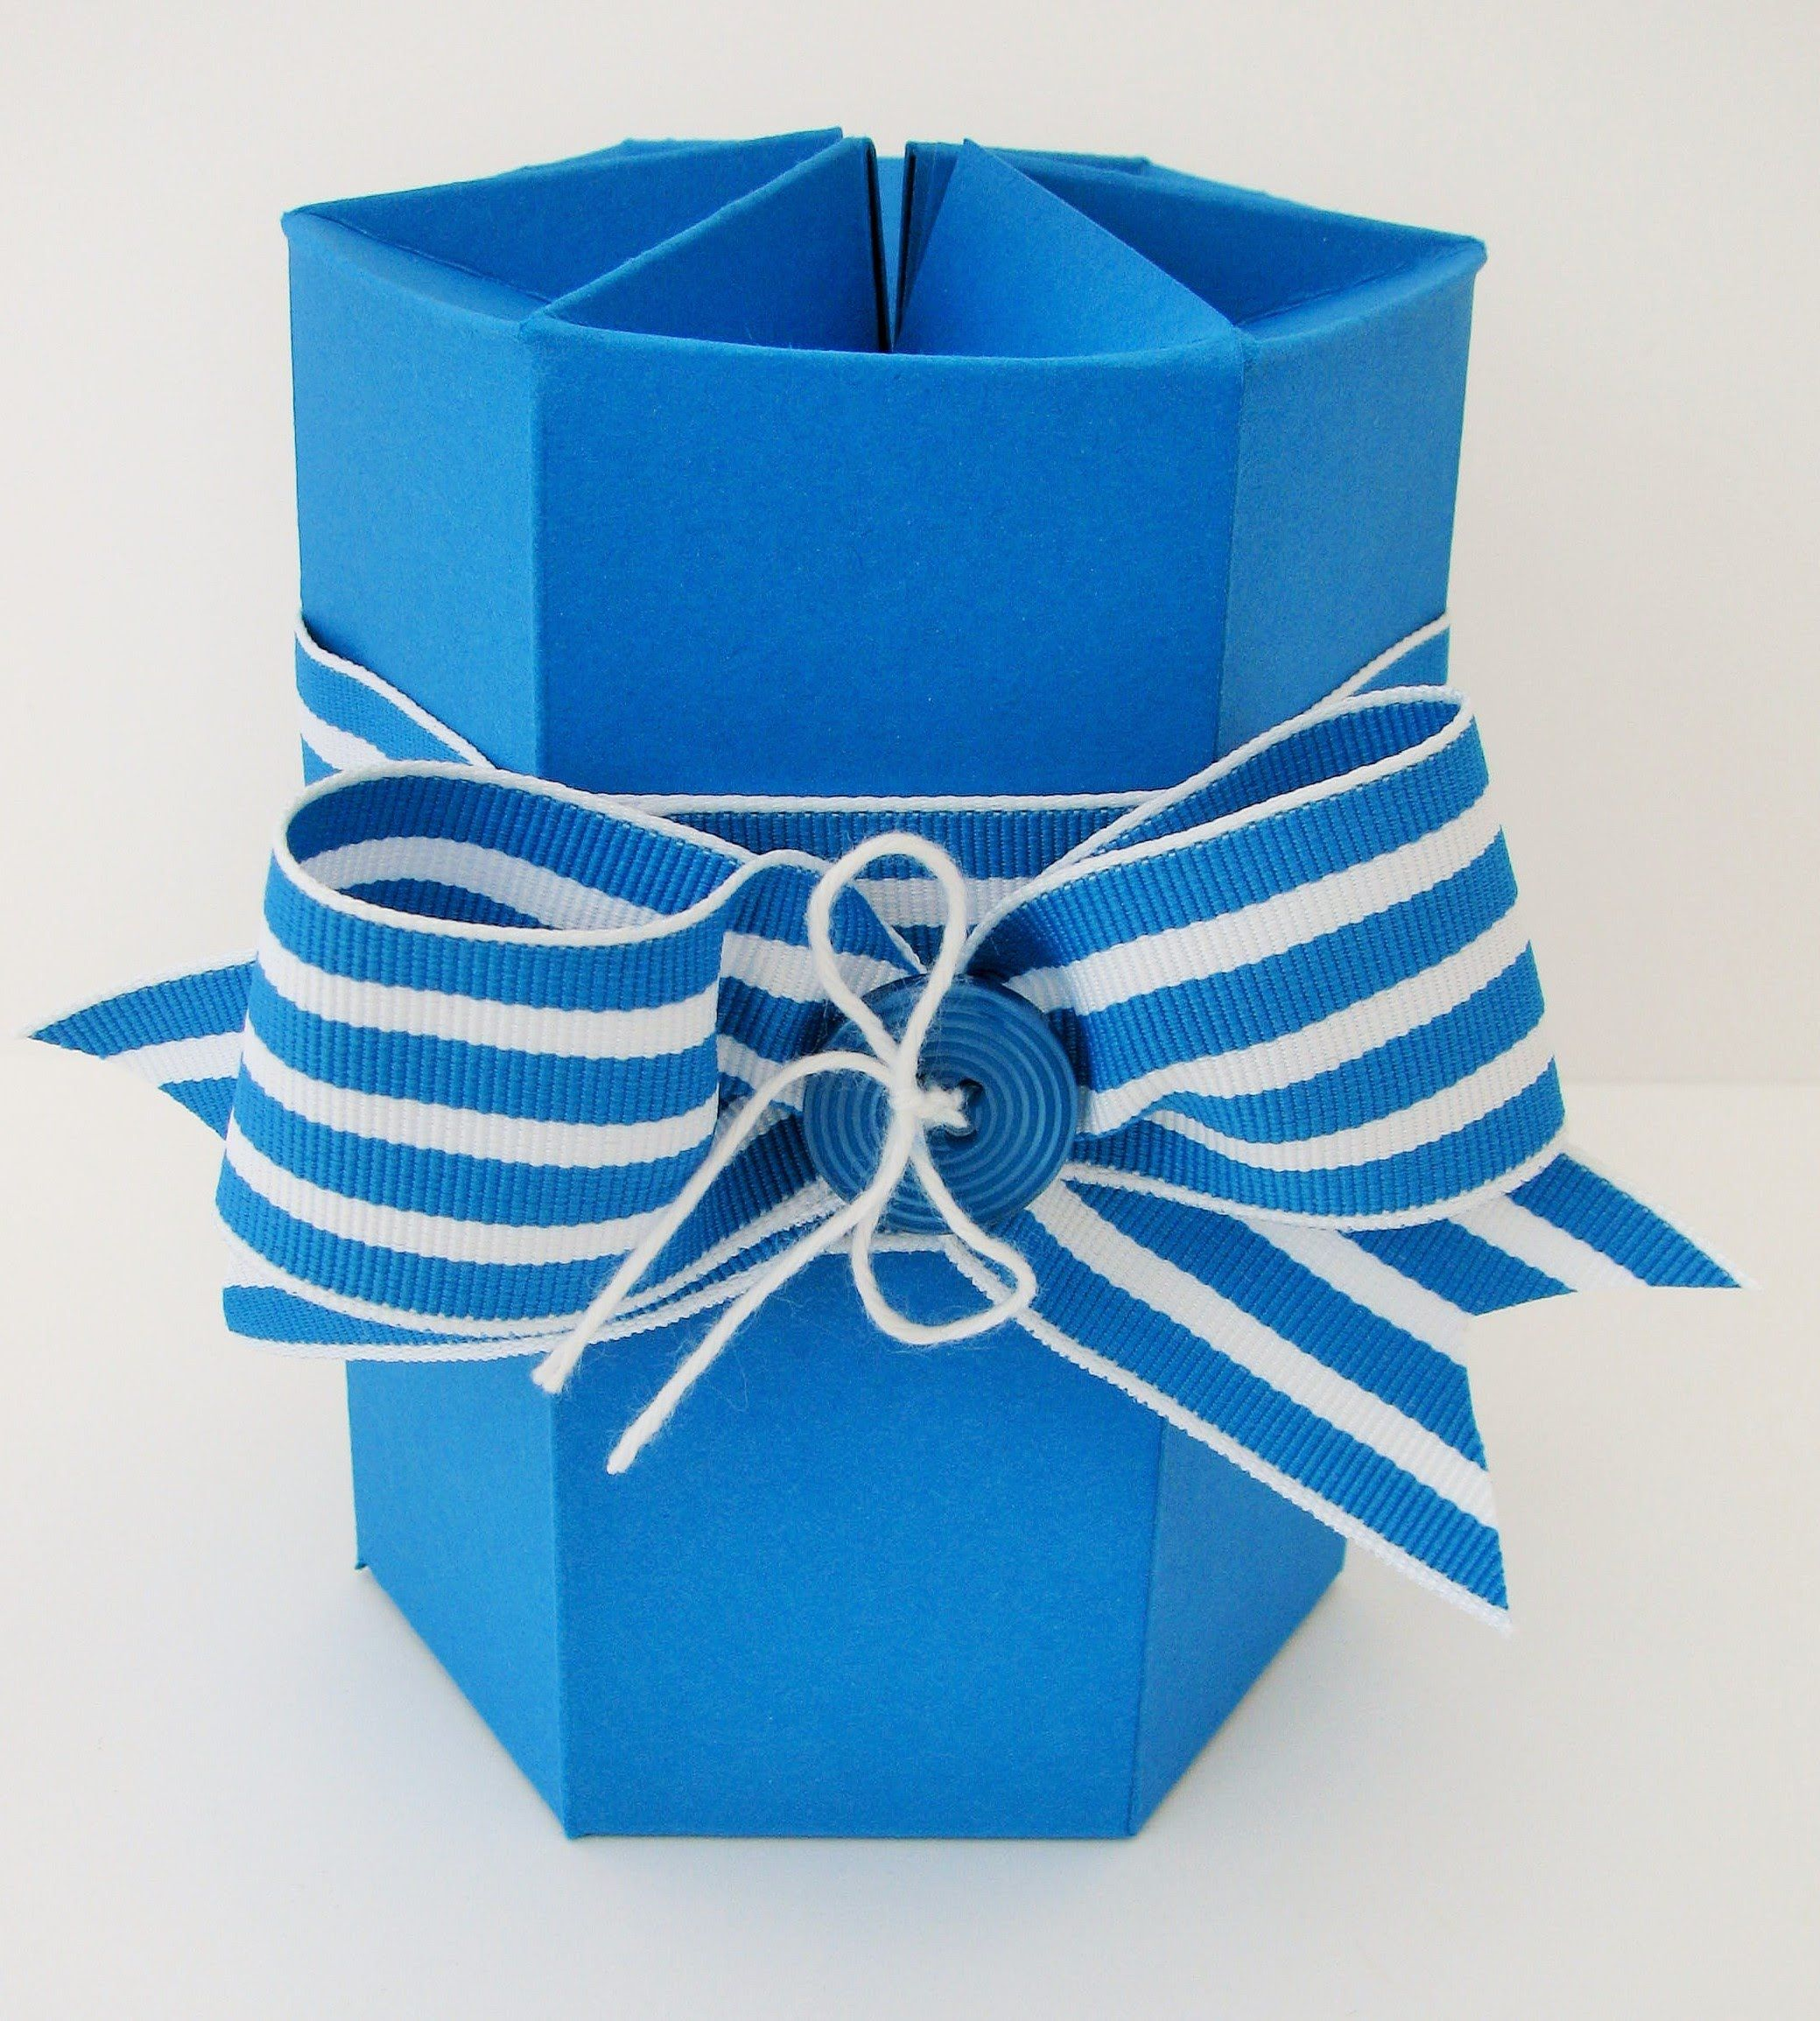 Hexagonal Self Closing Box (Stampin Up) | Boxes and Gifts ...